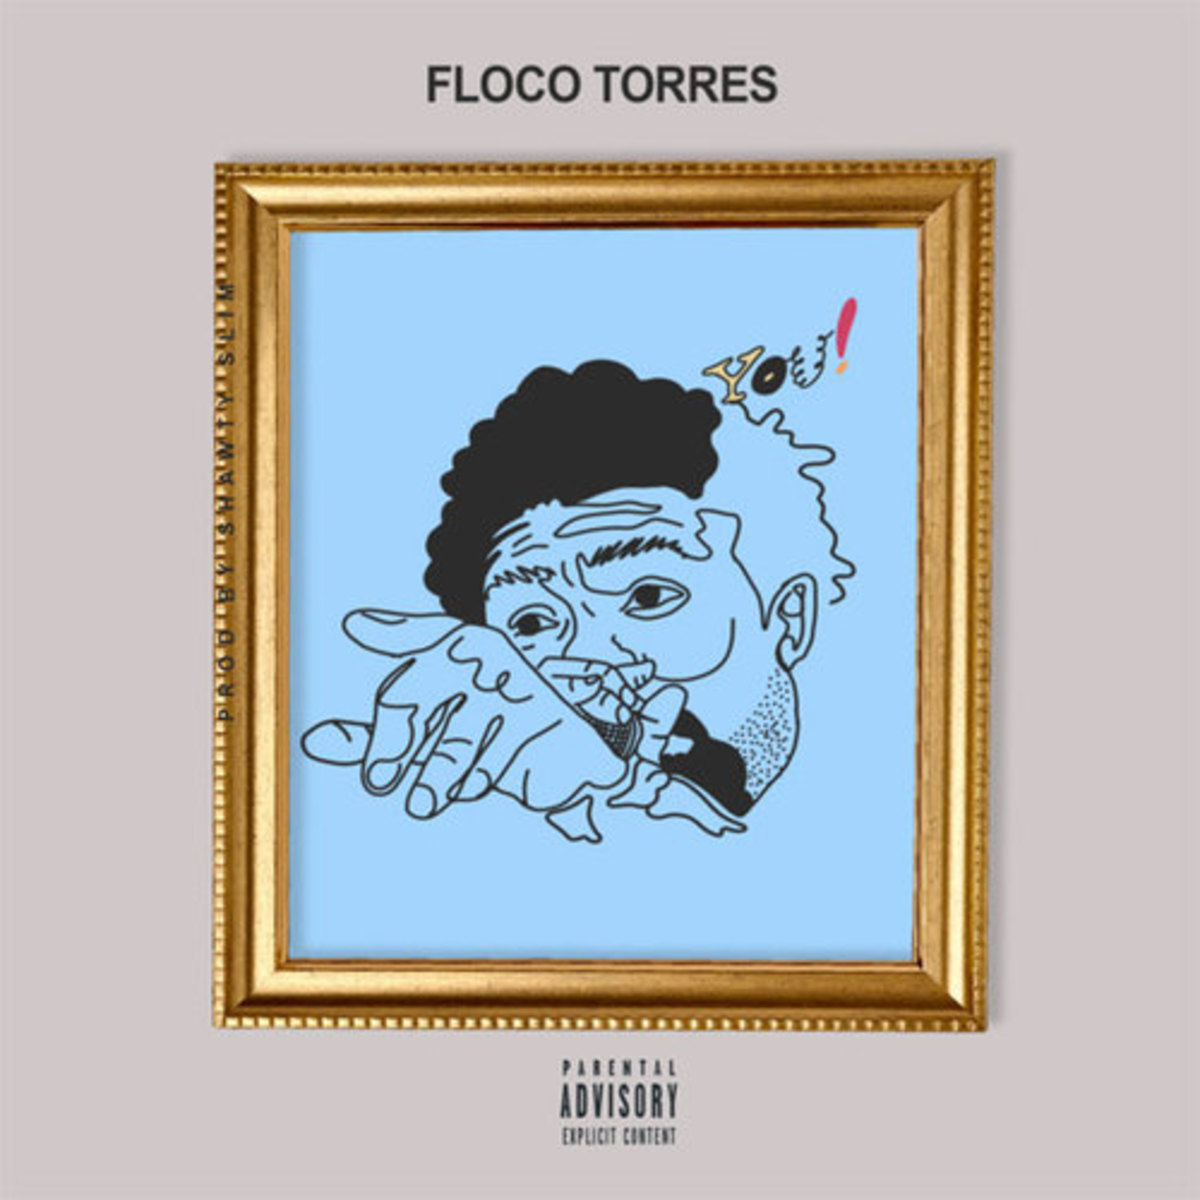 floco-torres-you.jpg